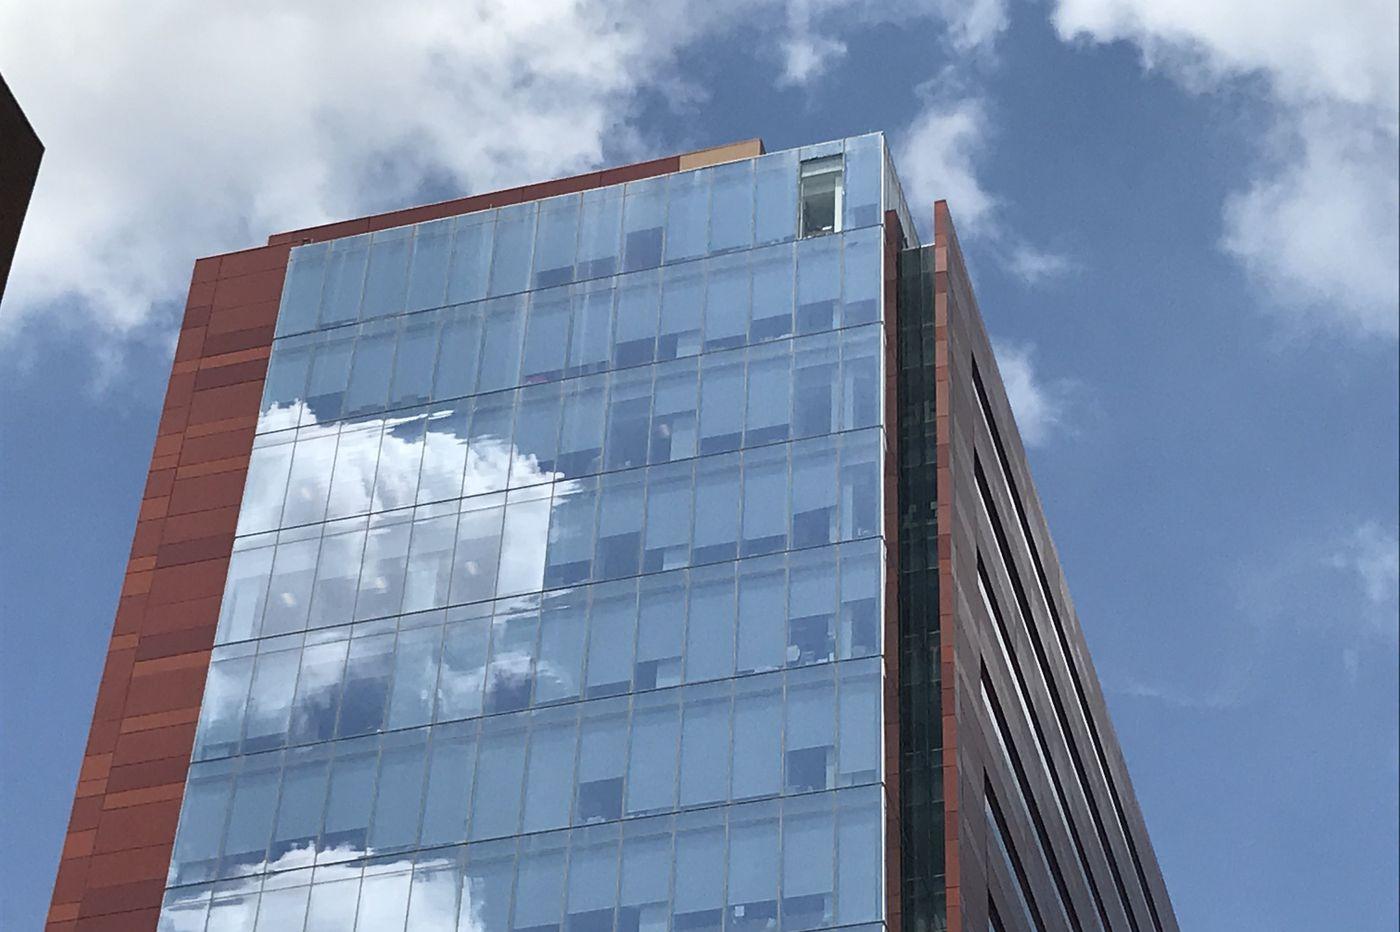 Penn Medicine building window falls from 20th floor, shattering on Center City street below